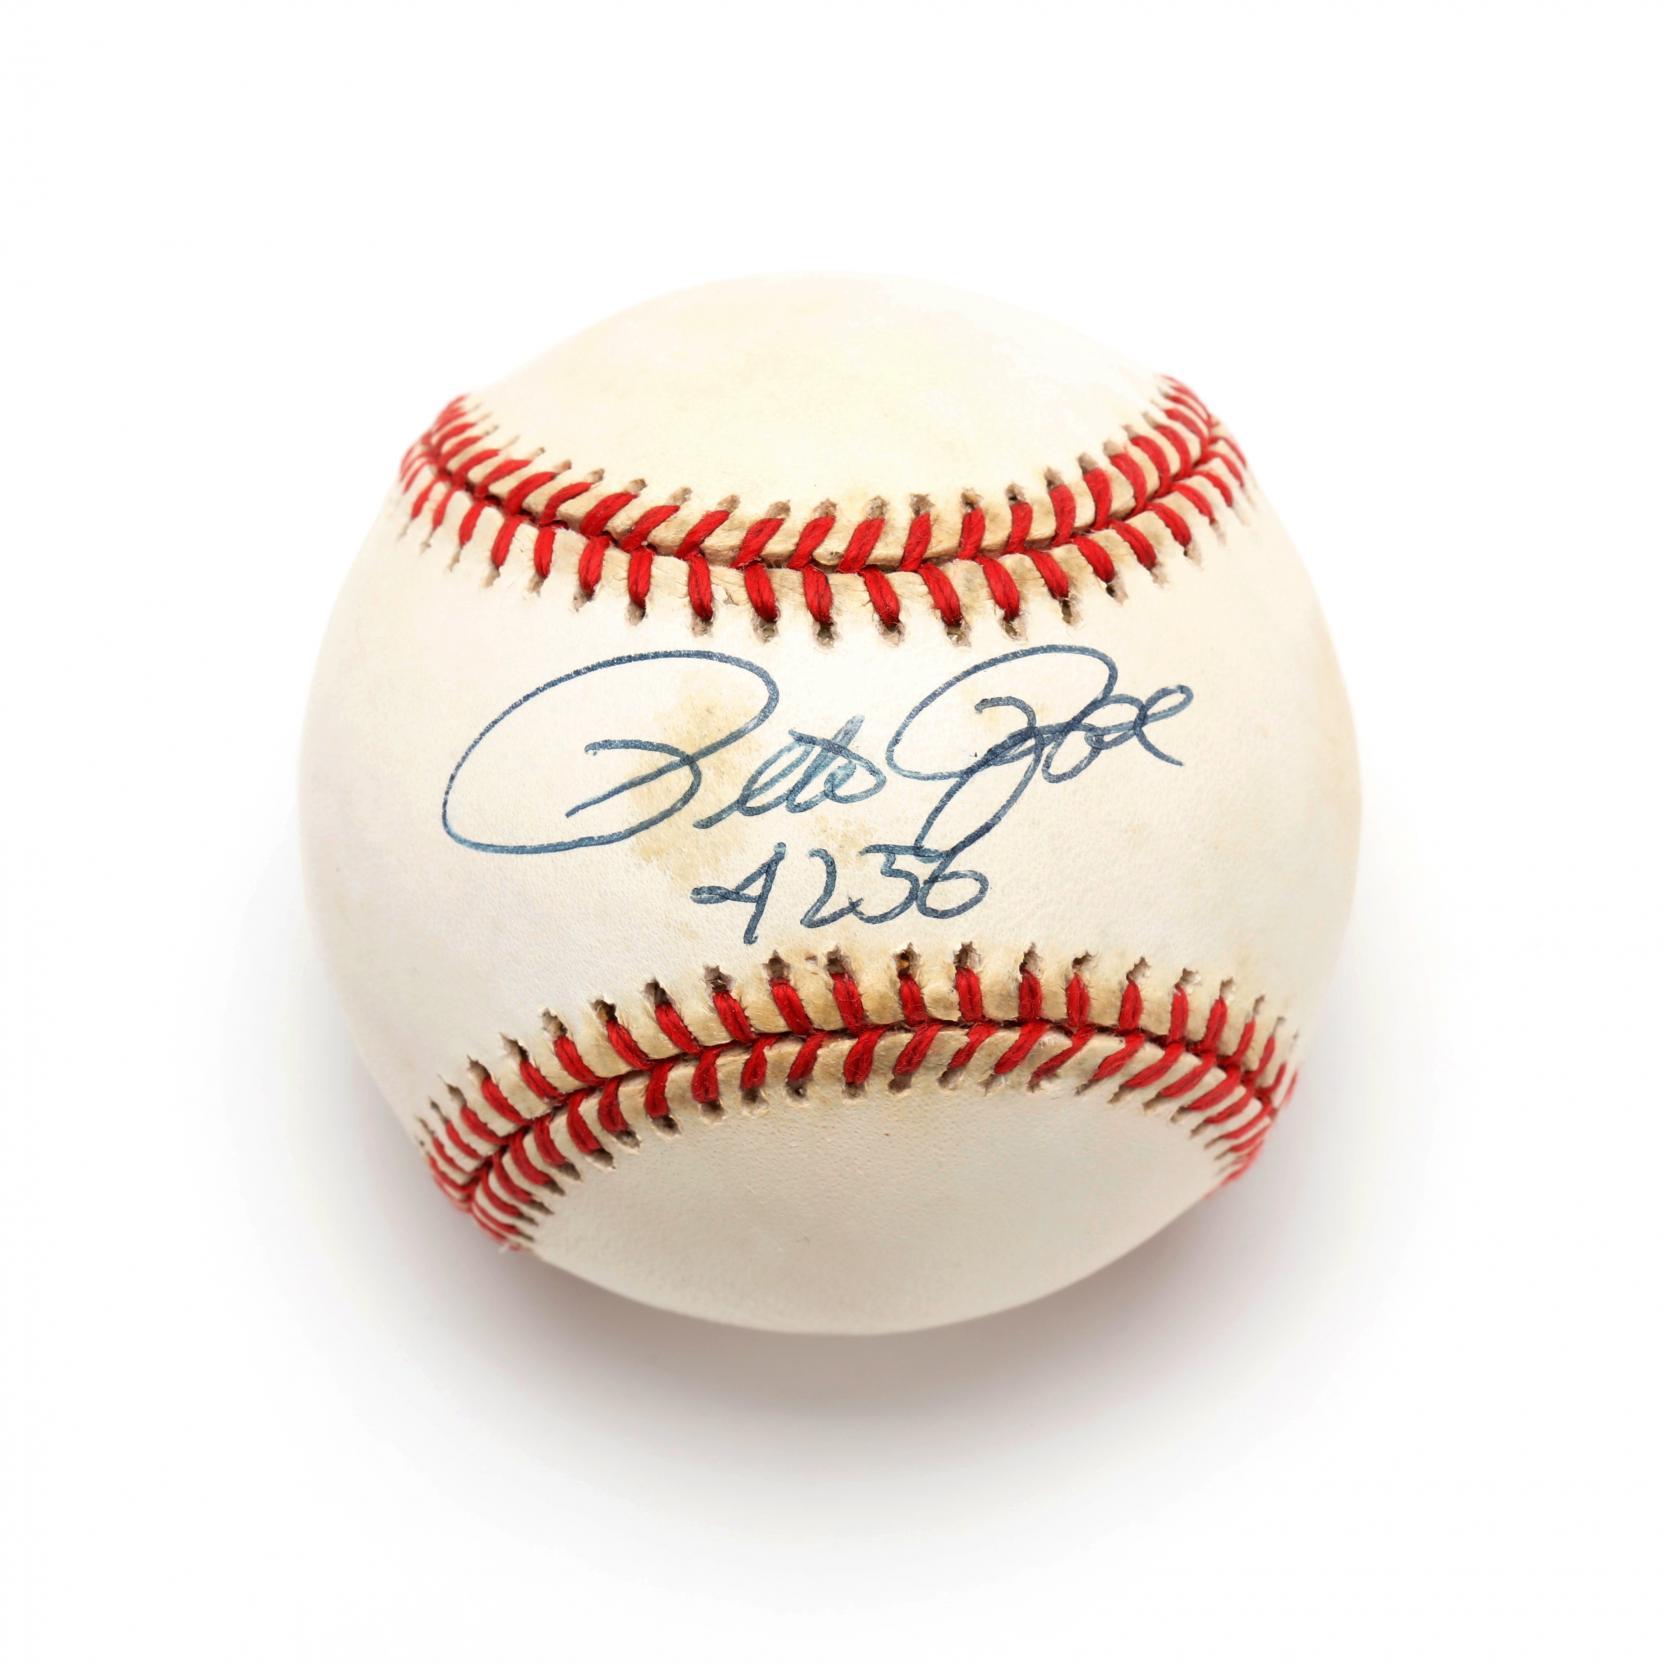 pete-rose-autographed-baseball